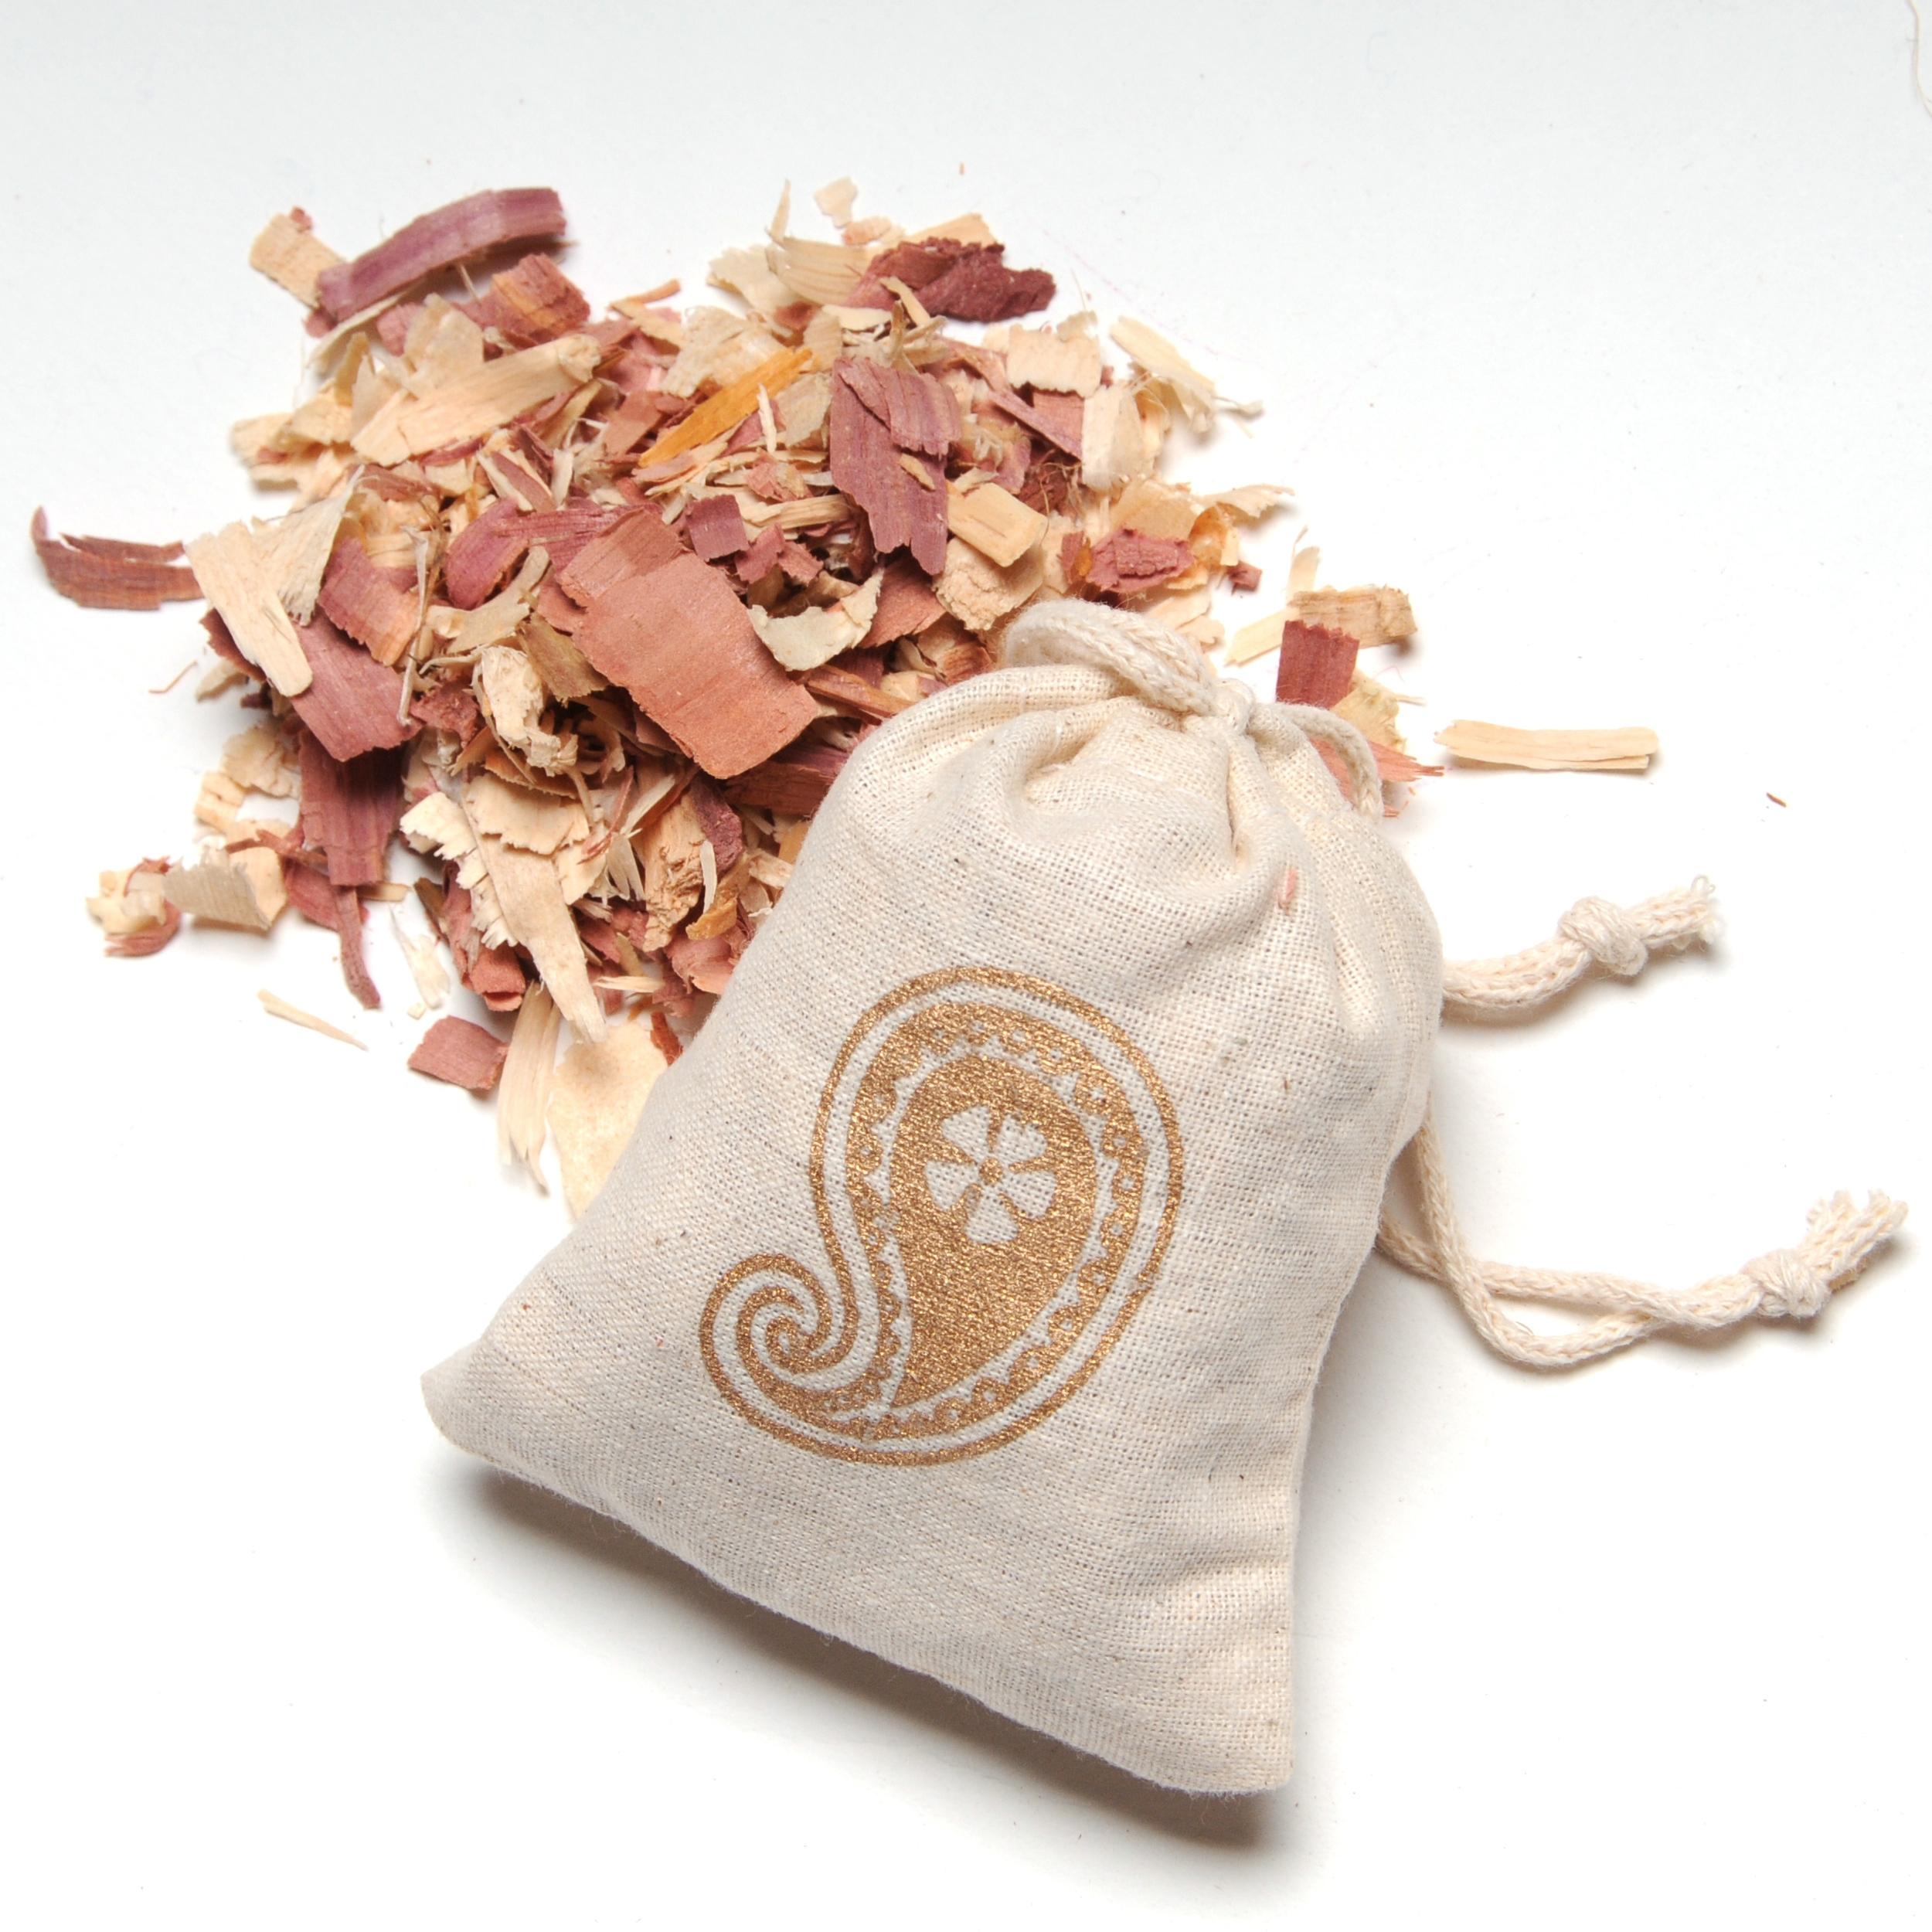 perfumed cedar wood sachet